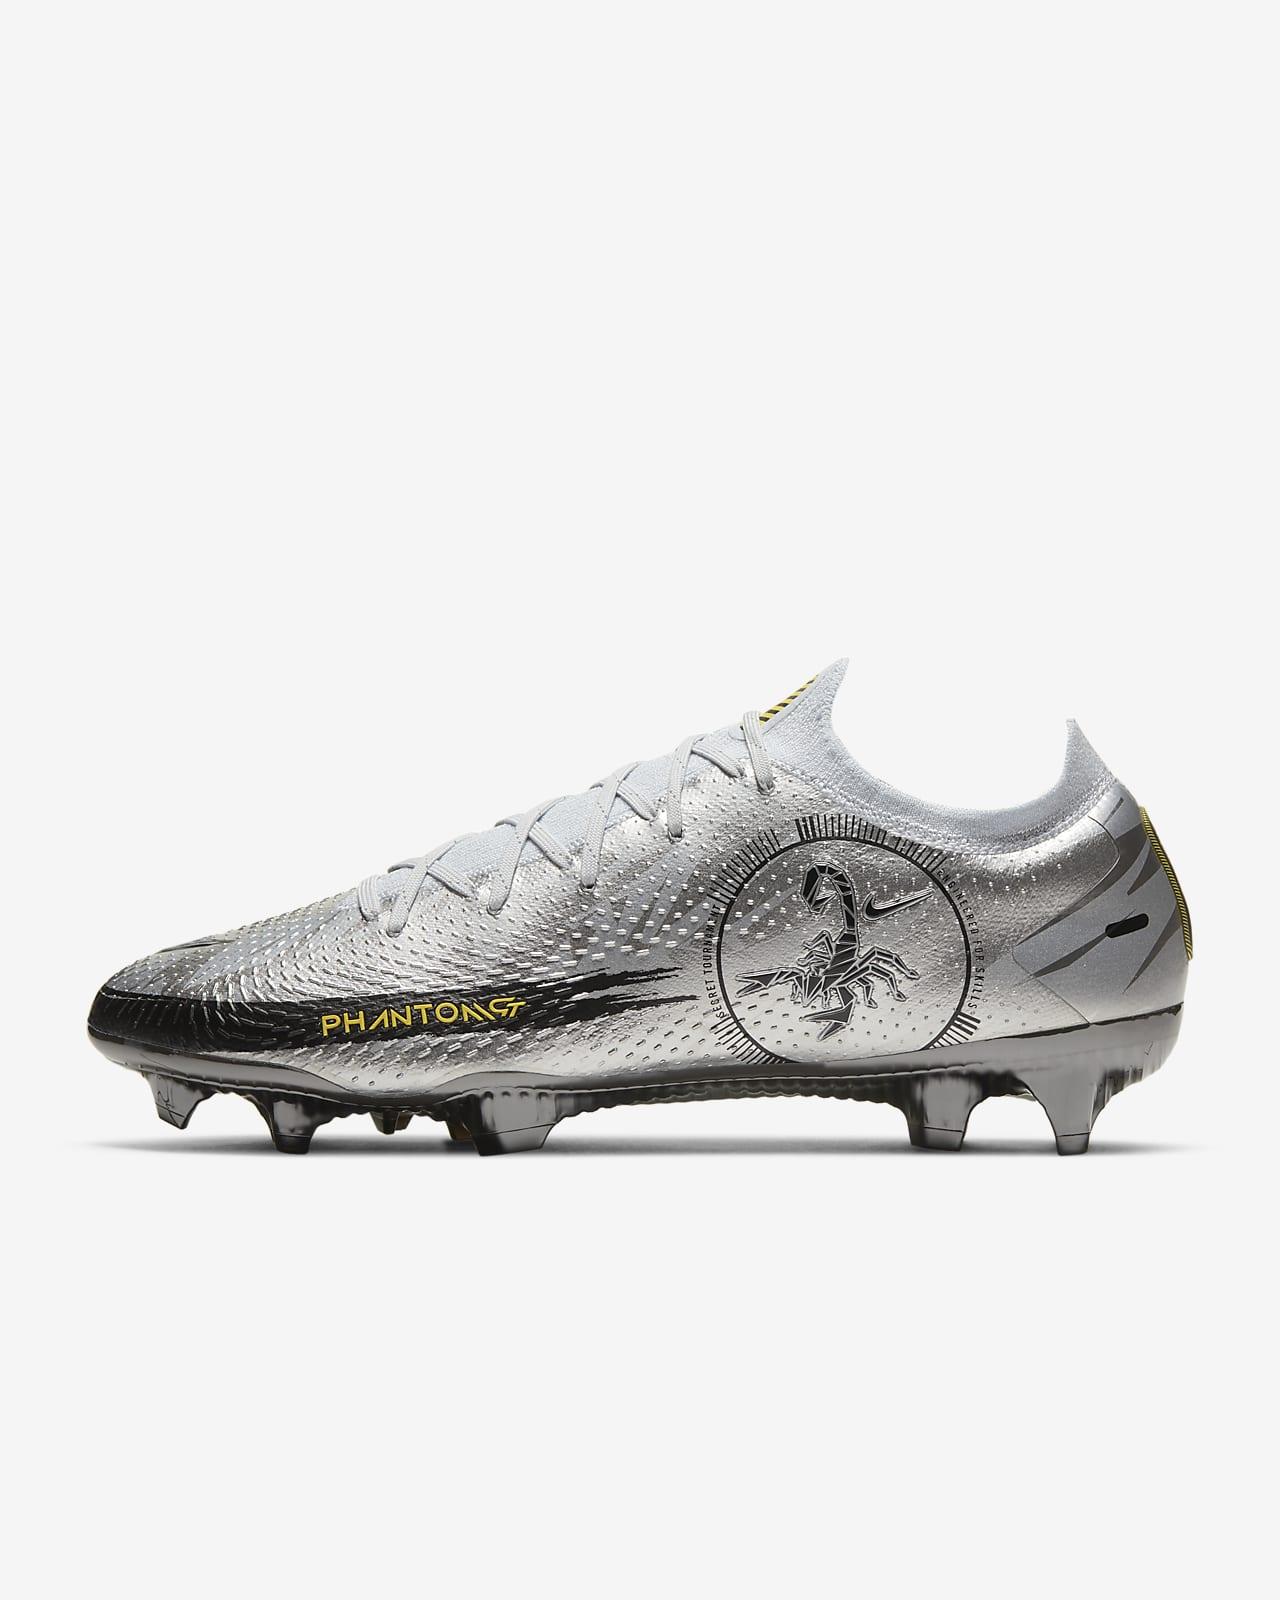 Nike Phantom Scorpion Elite FG stoplis futballcipő normál talajra